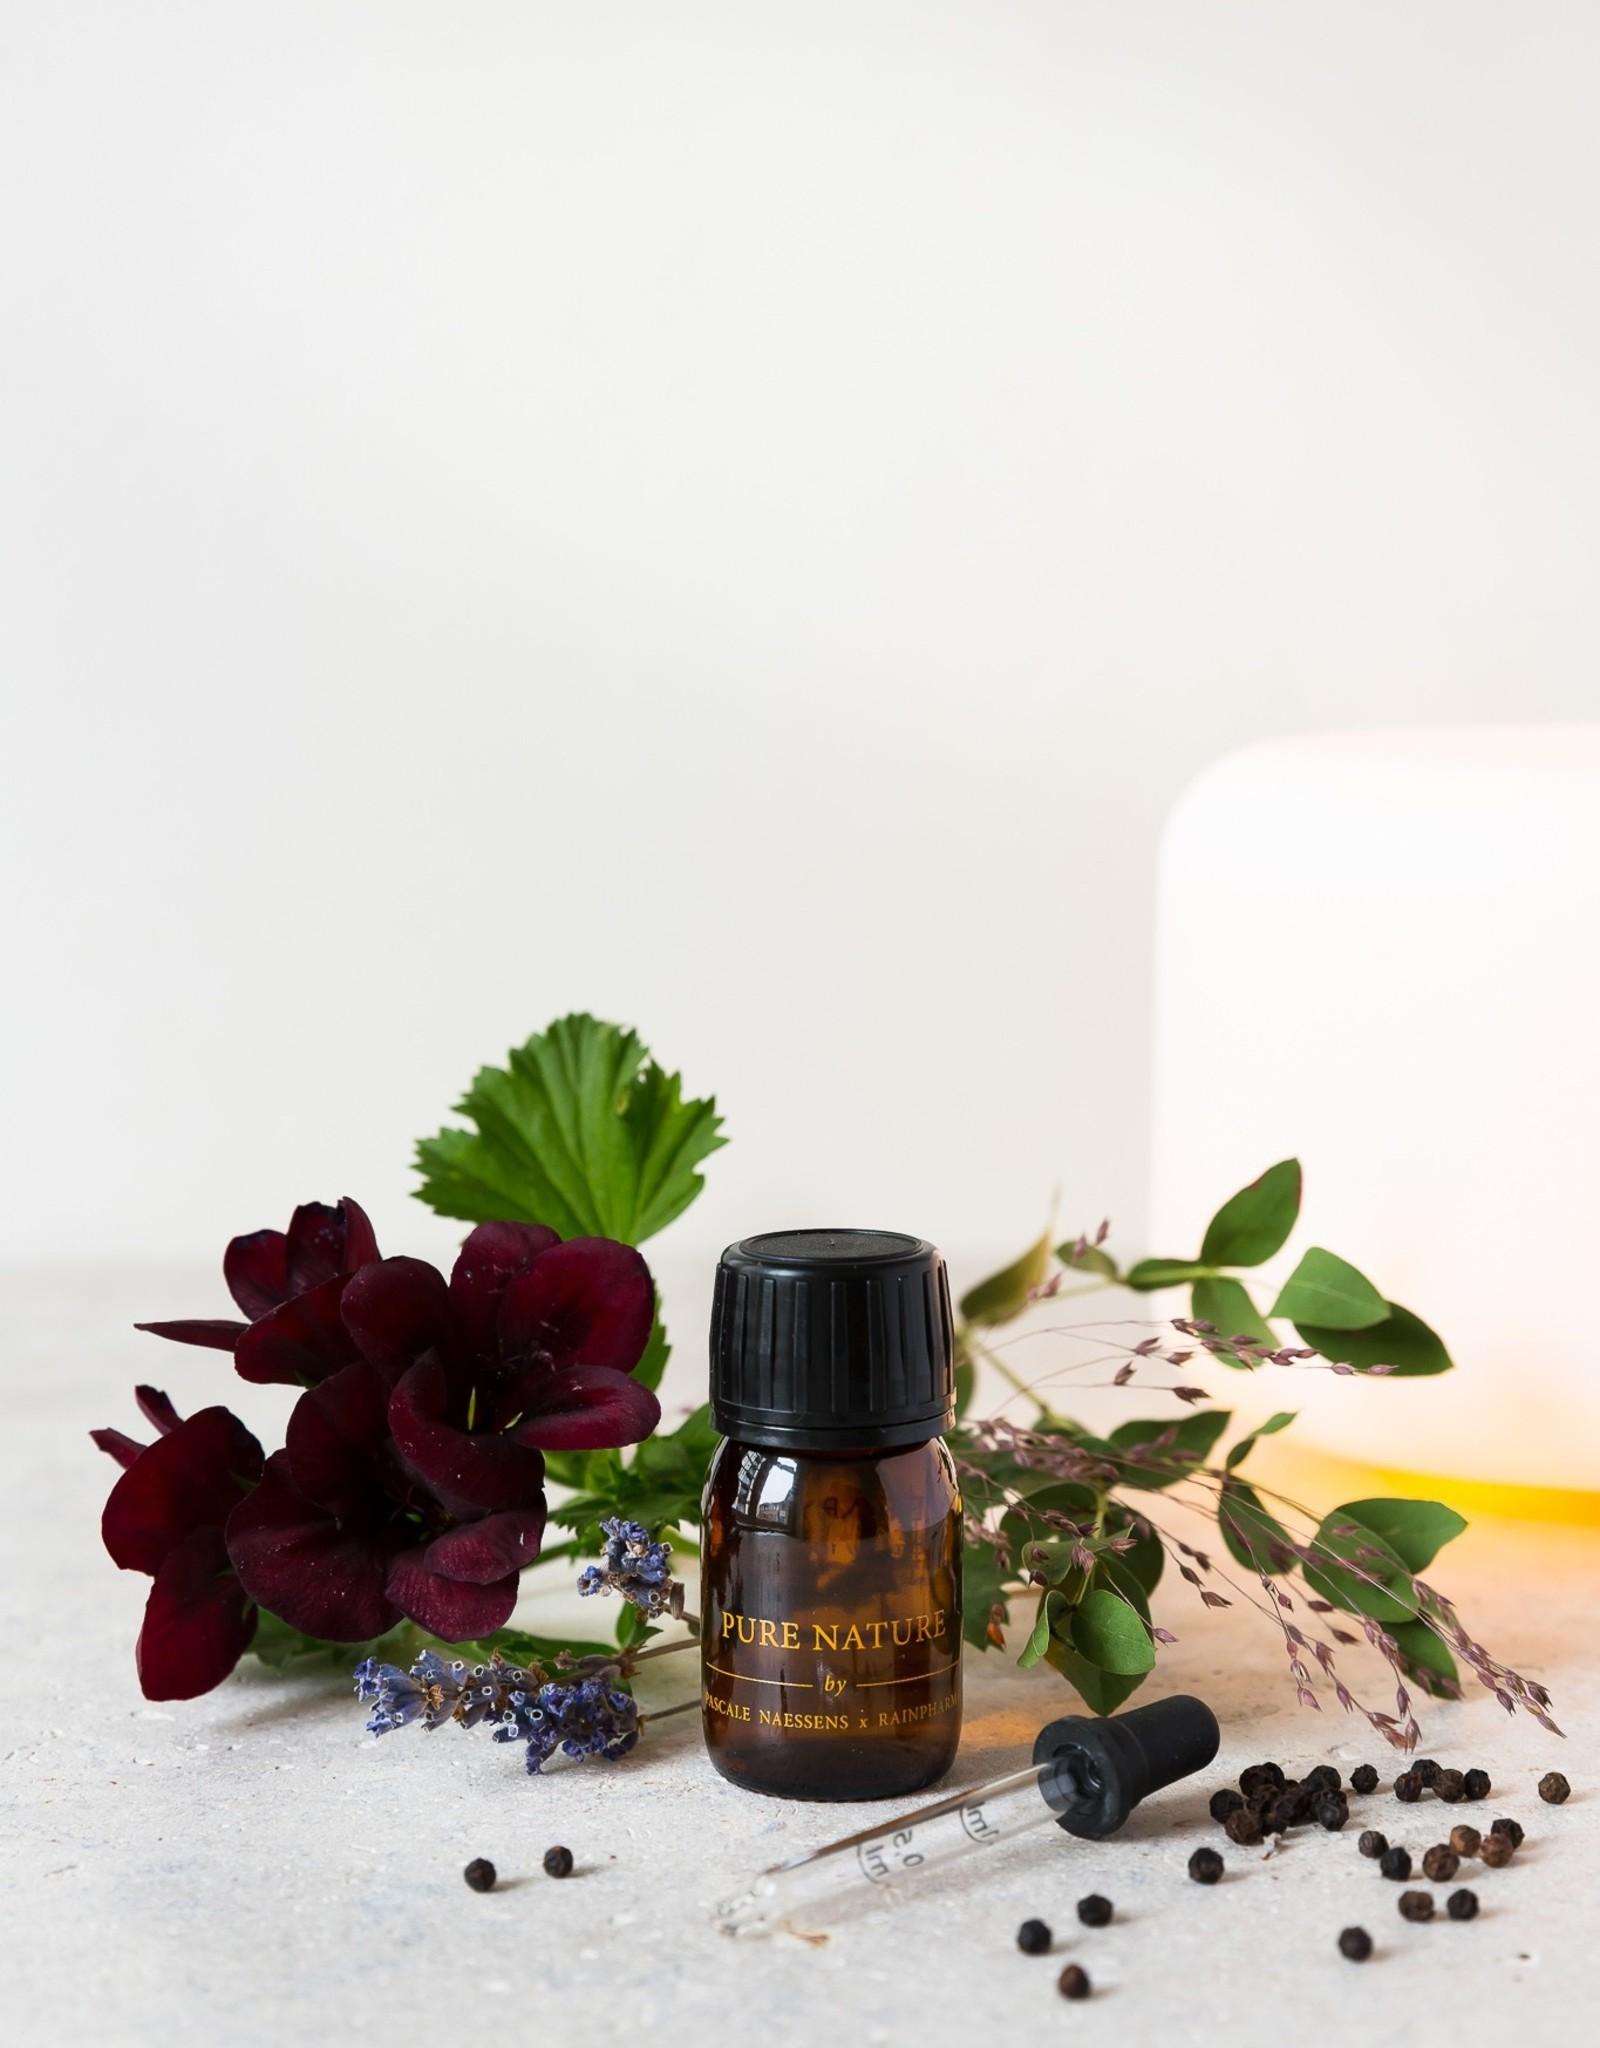 RainPharma Essential Oil Pure Nature 30ml - Rainpharma